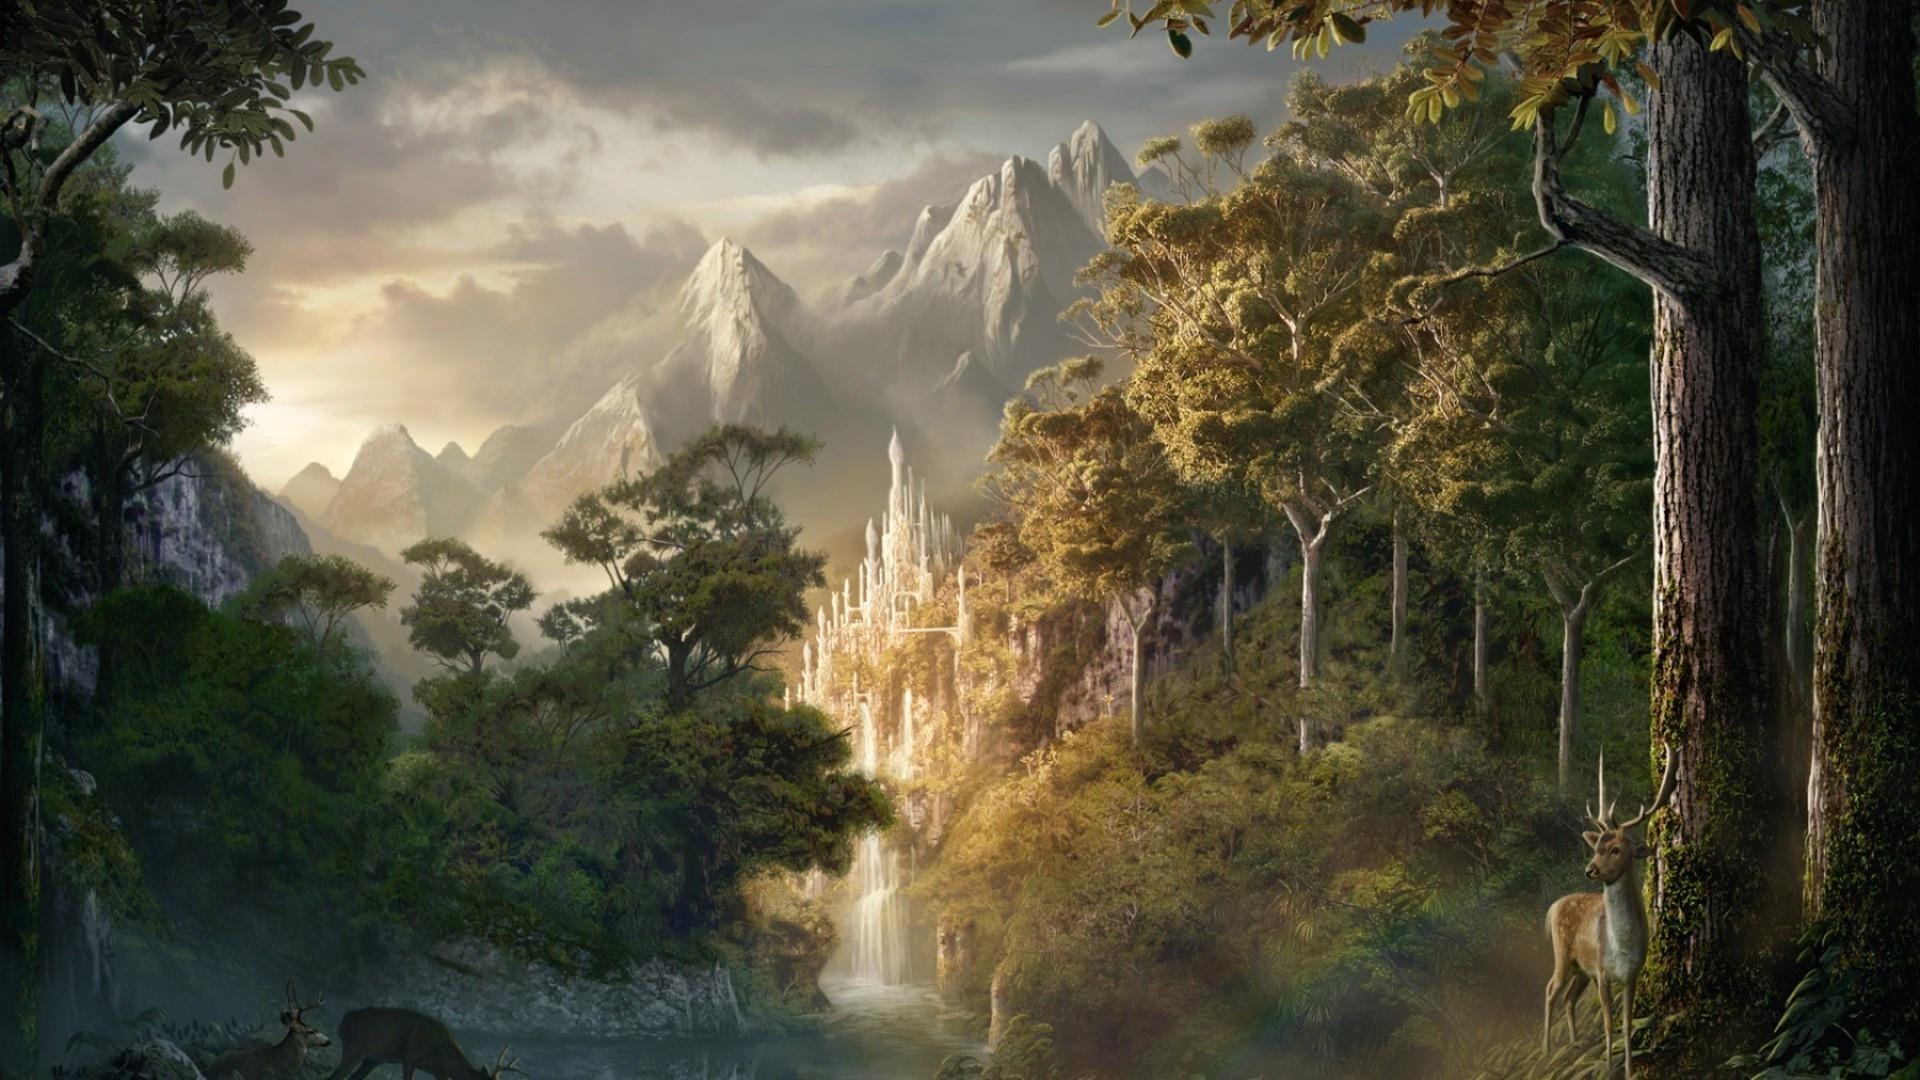 Fantasy Landsсape wallpaper photo hd